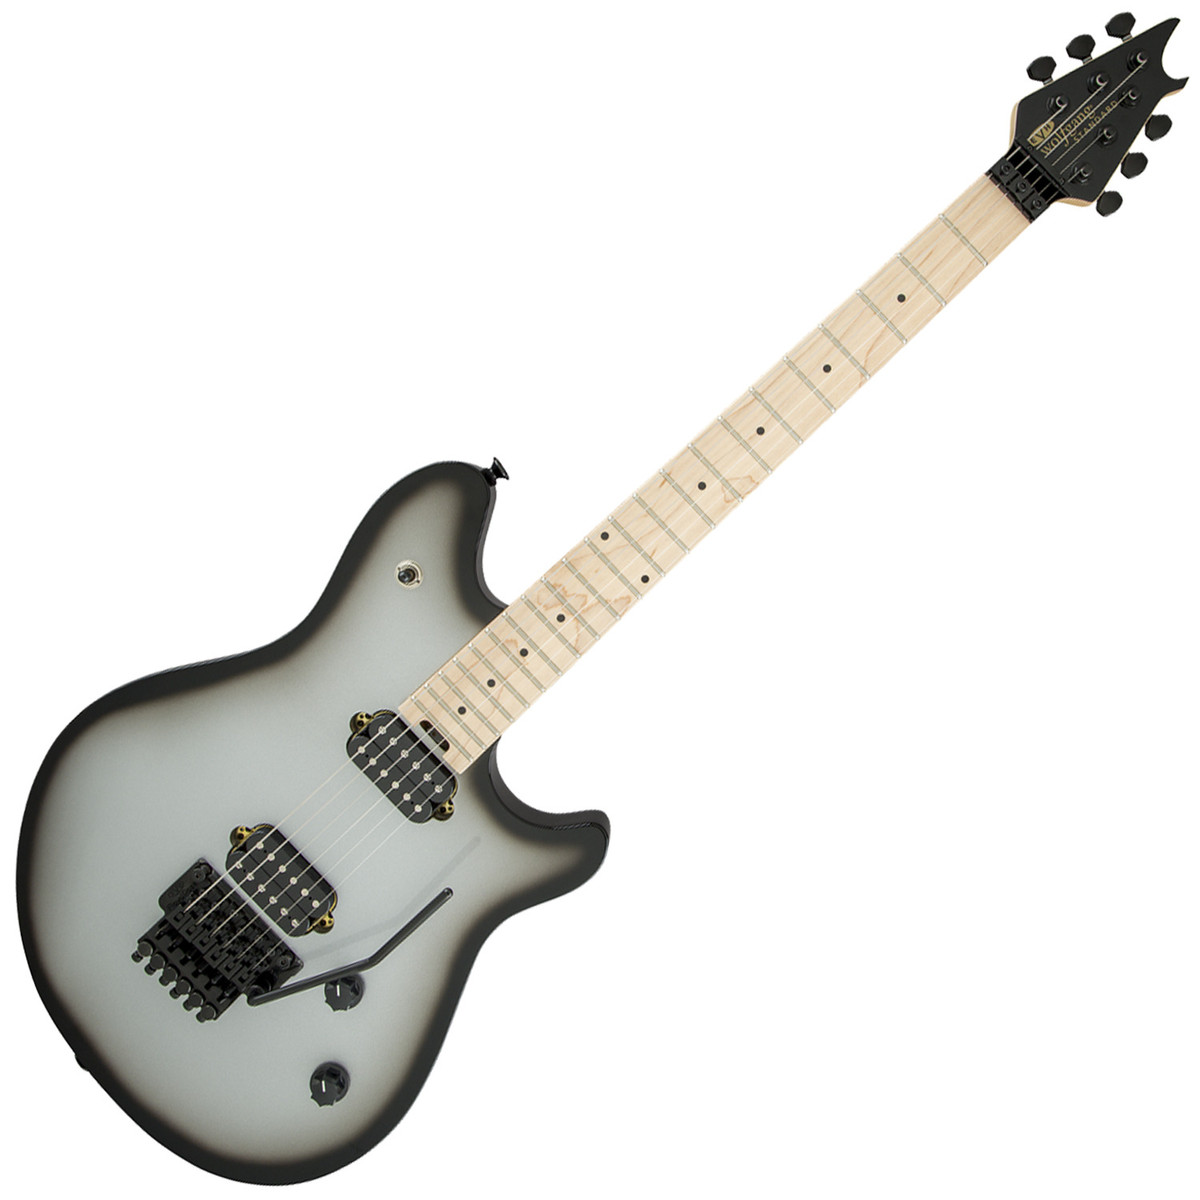 evh wolfgang standard electric guitar mn silverburst at gear4music. Black Bedroom Furniture Sets. Home Design Ideas